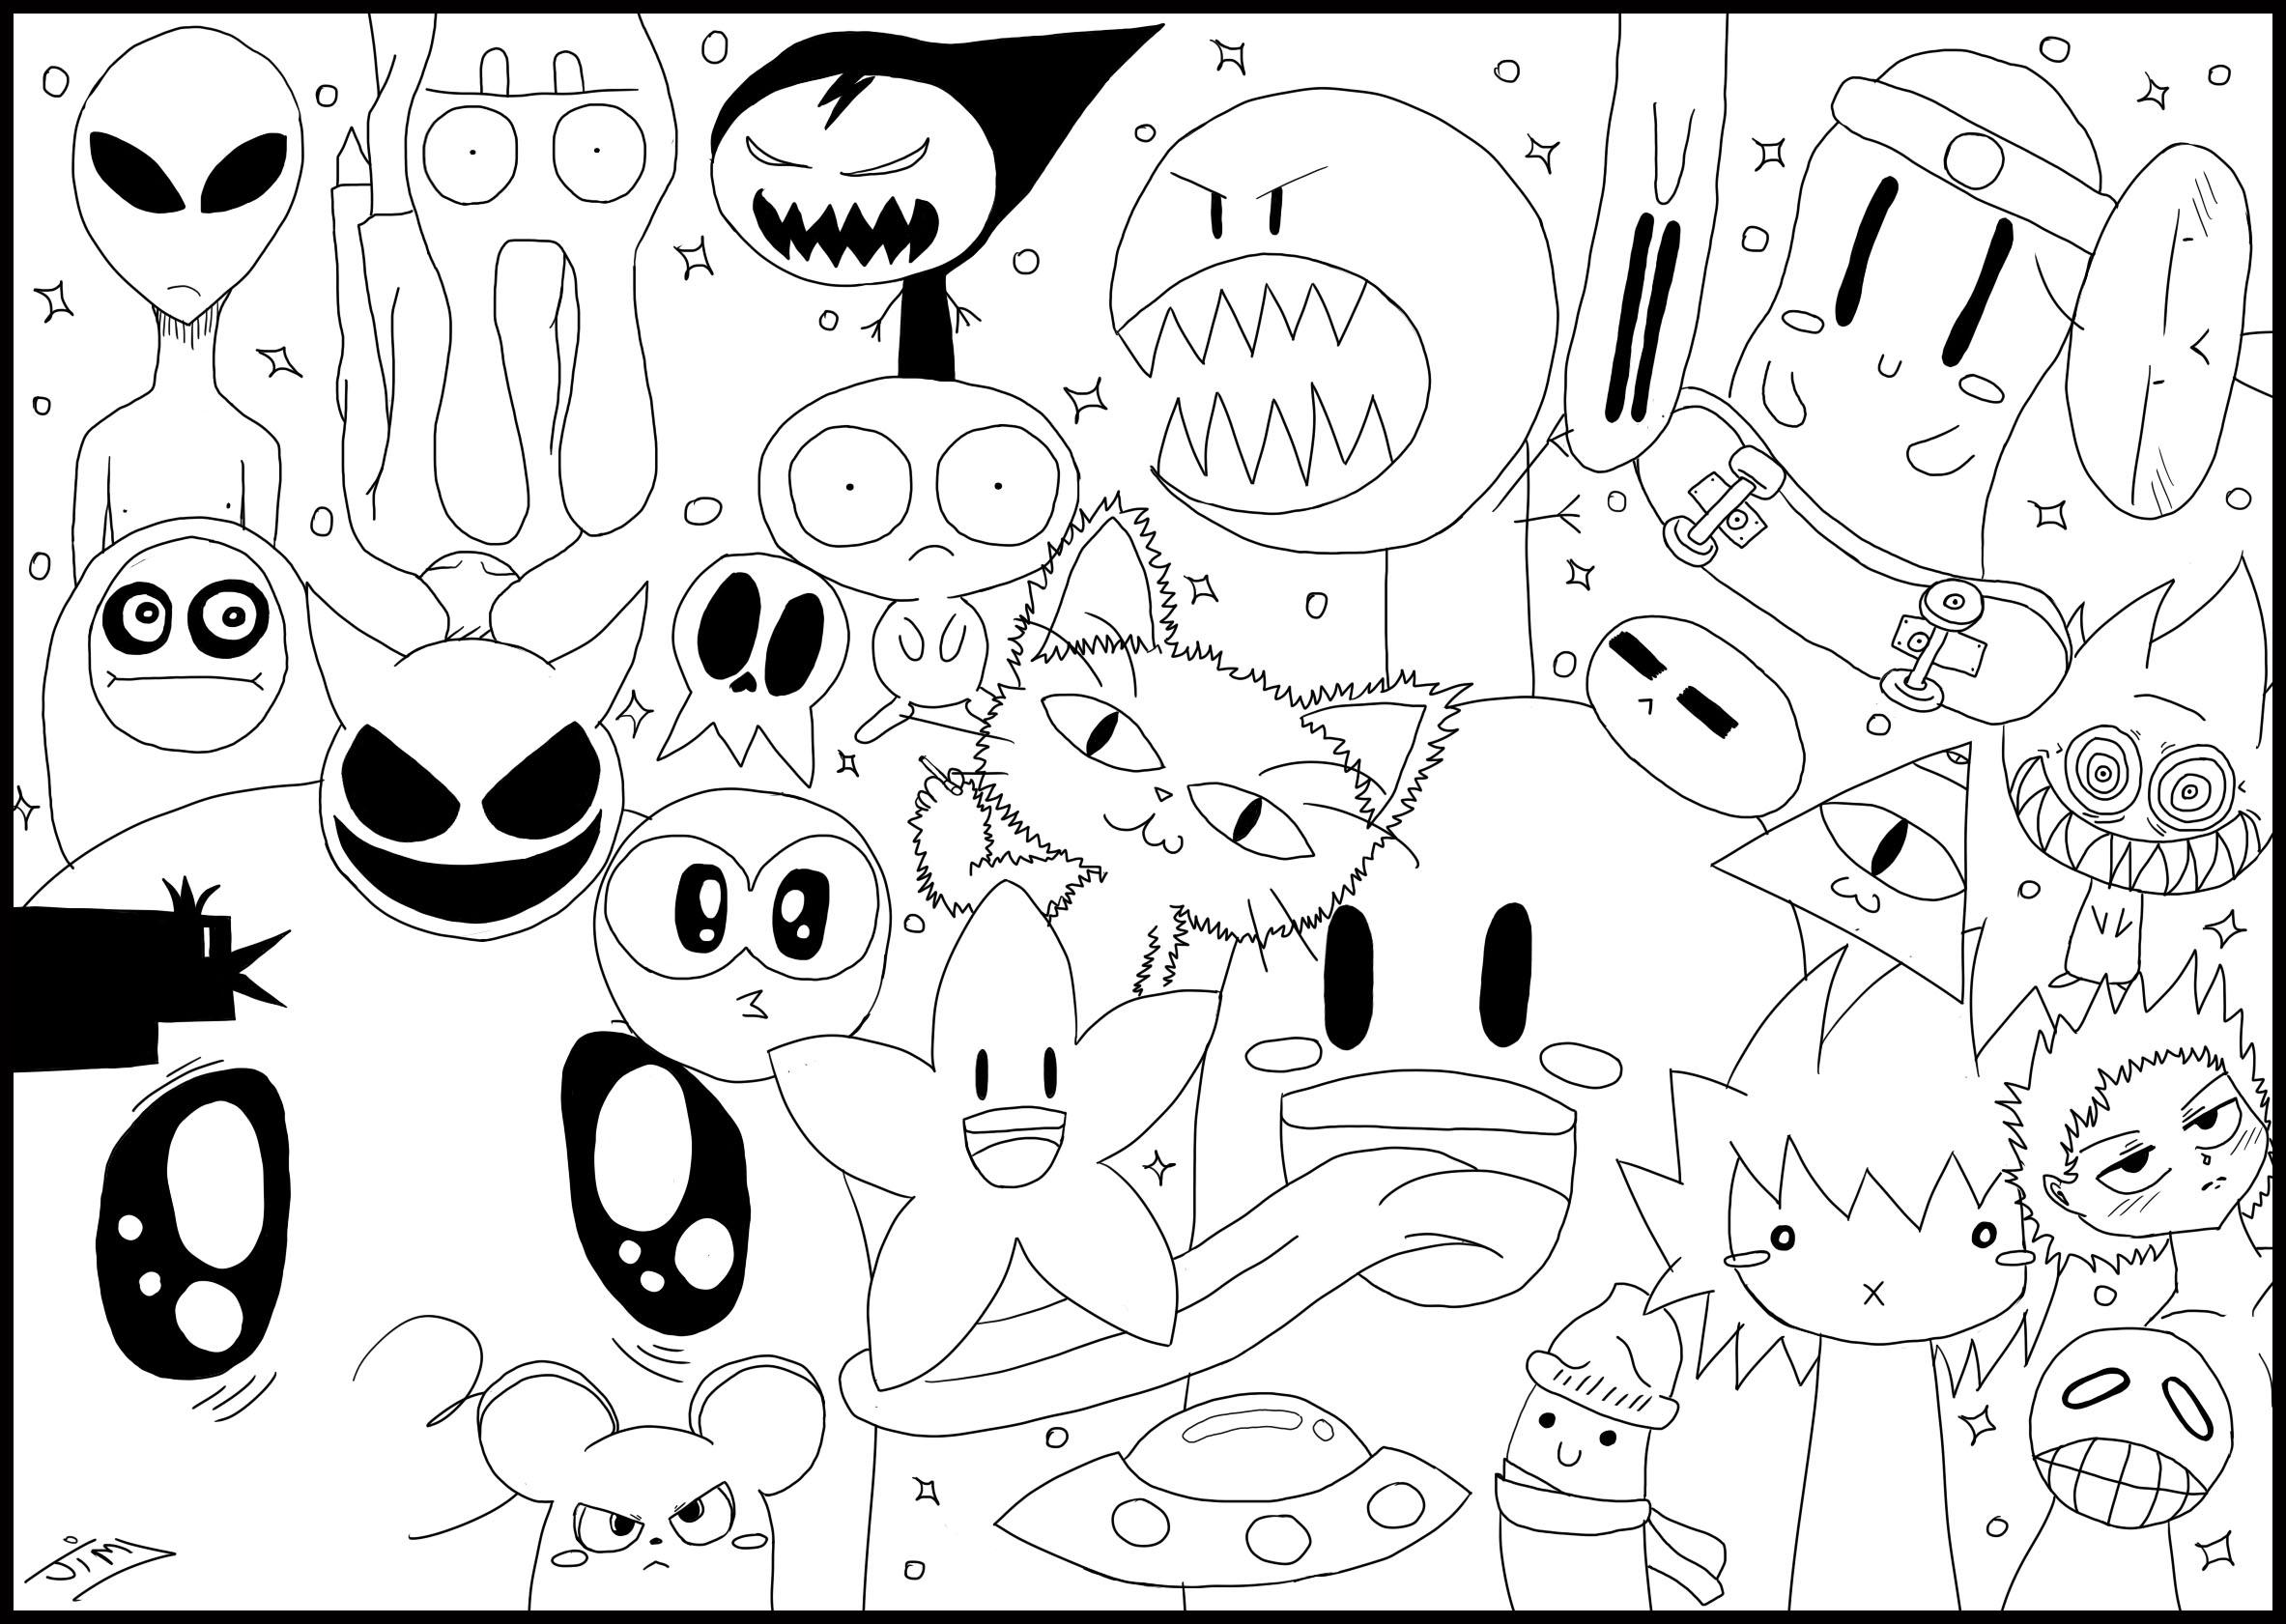 Doodle art doodling 91928